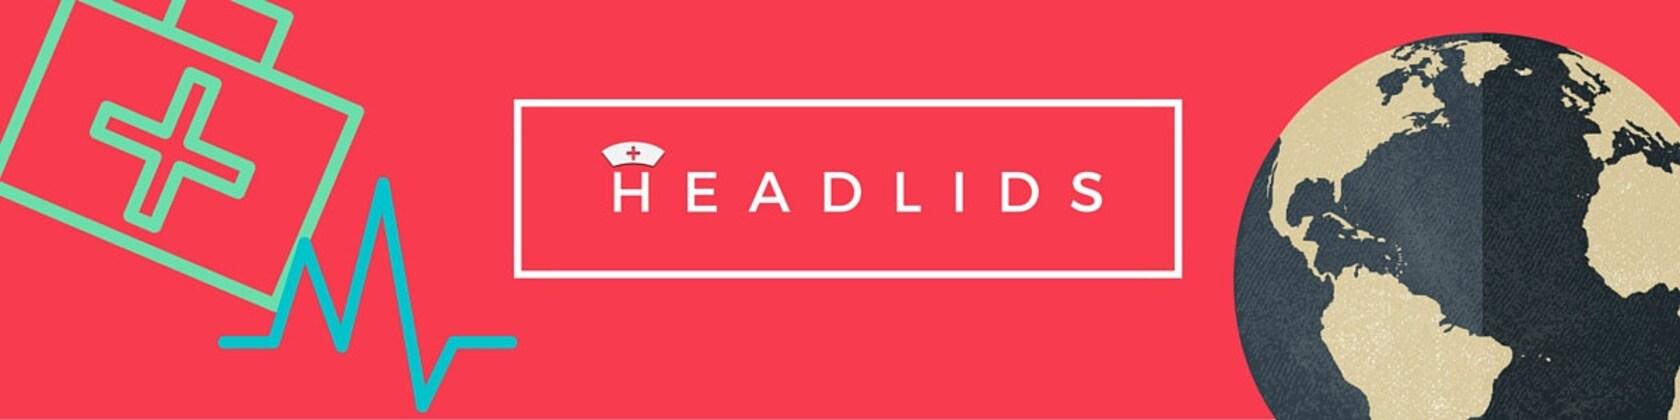 fd019b4cb33 IT'S NOT JUST A HAT IT'S A HEADLIDS® Surgical hats by Headlids